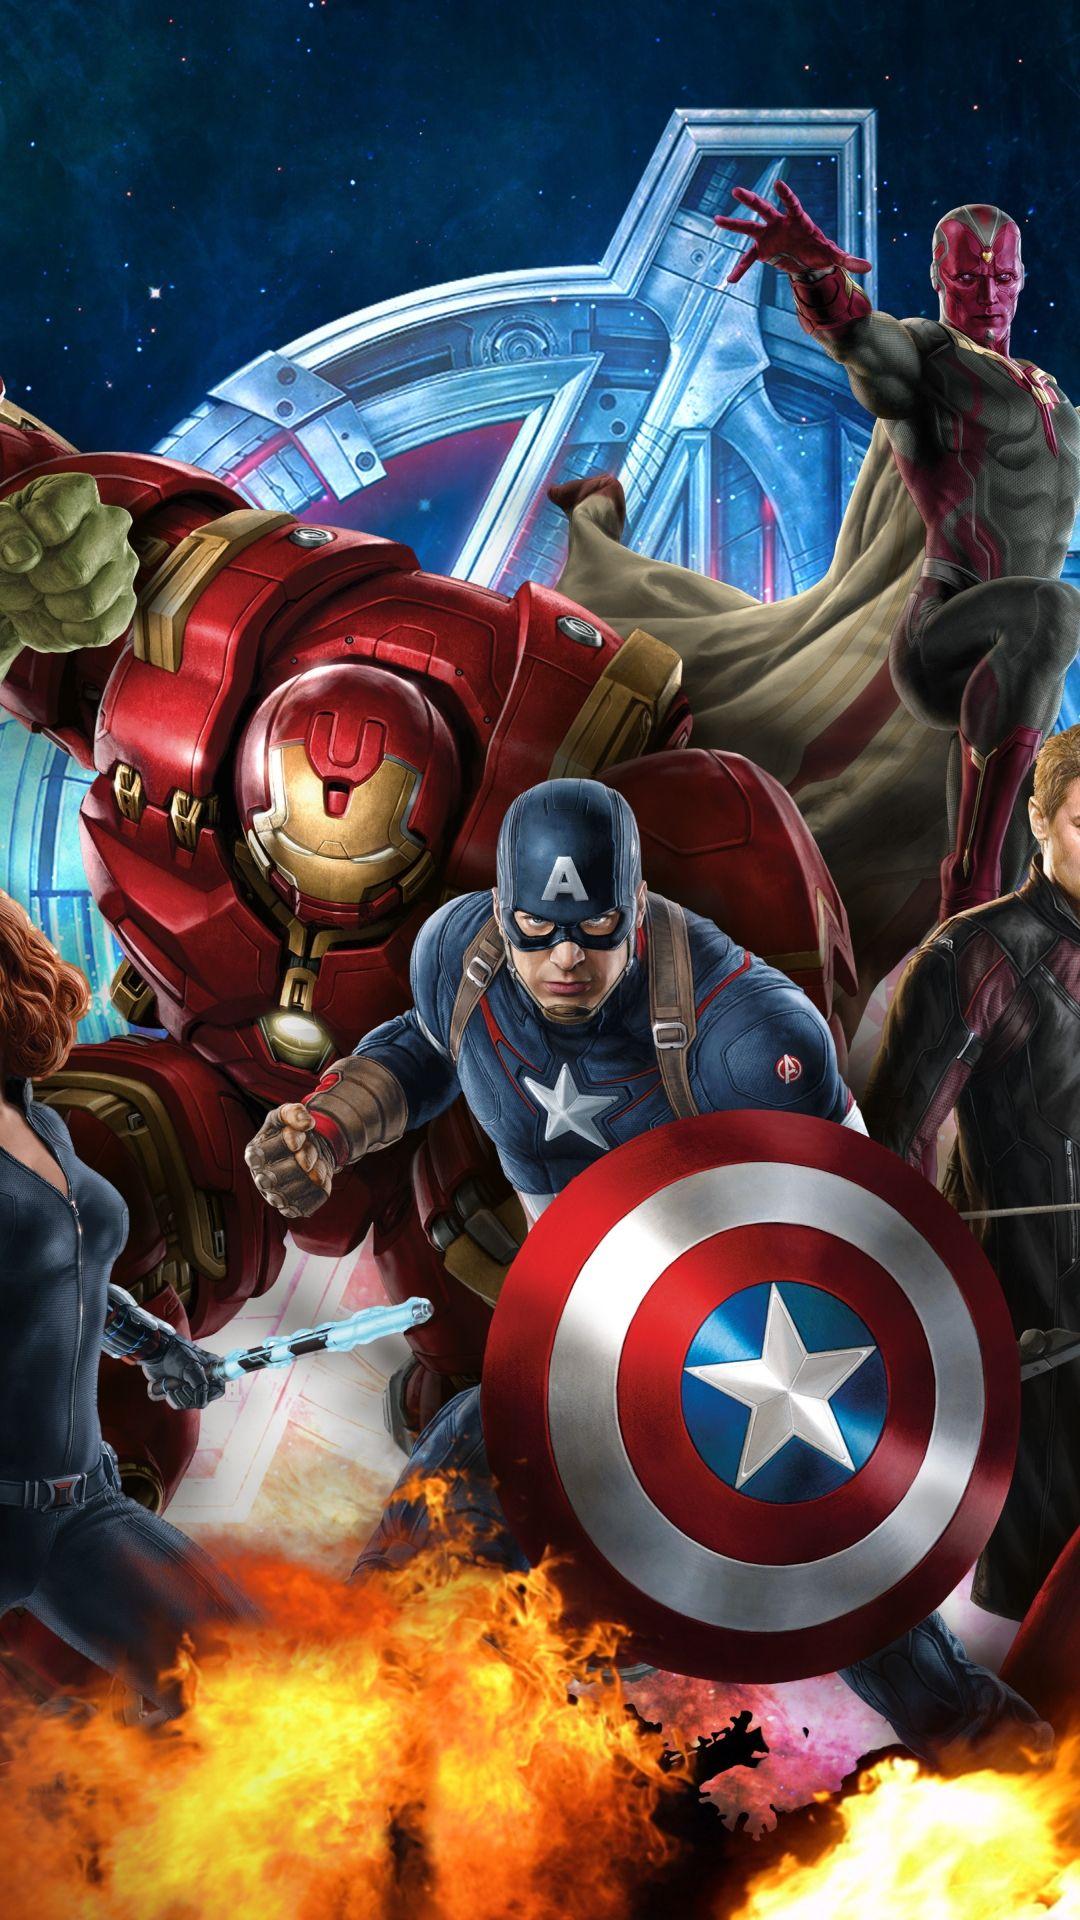 The Avengers hd wallpaper